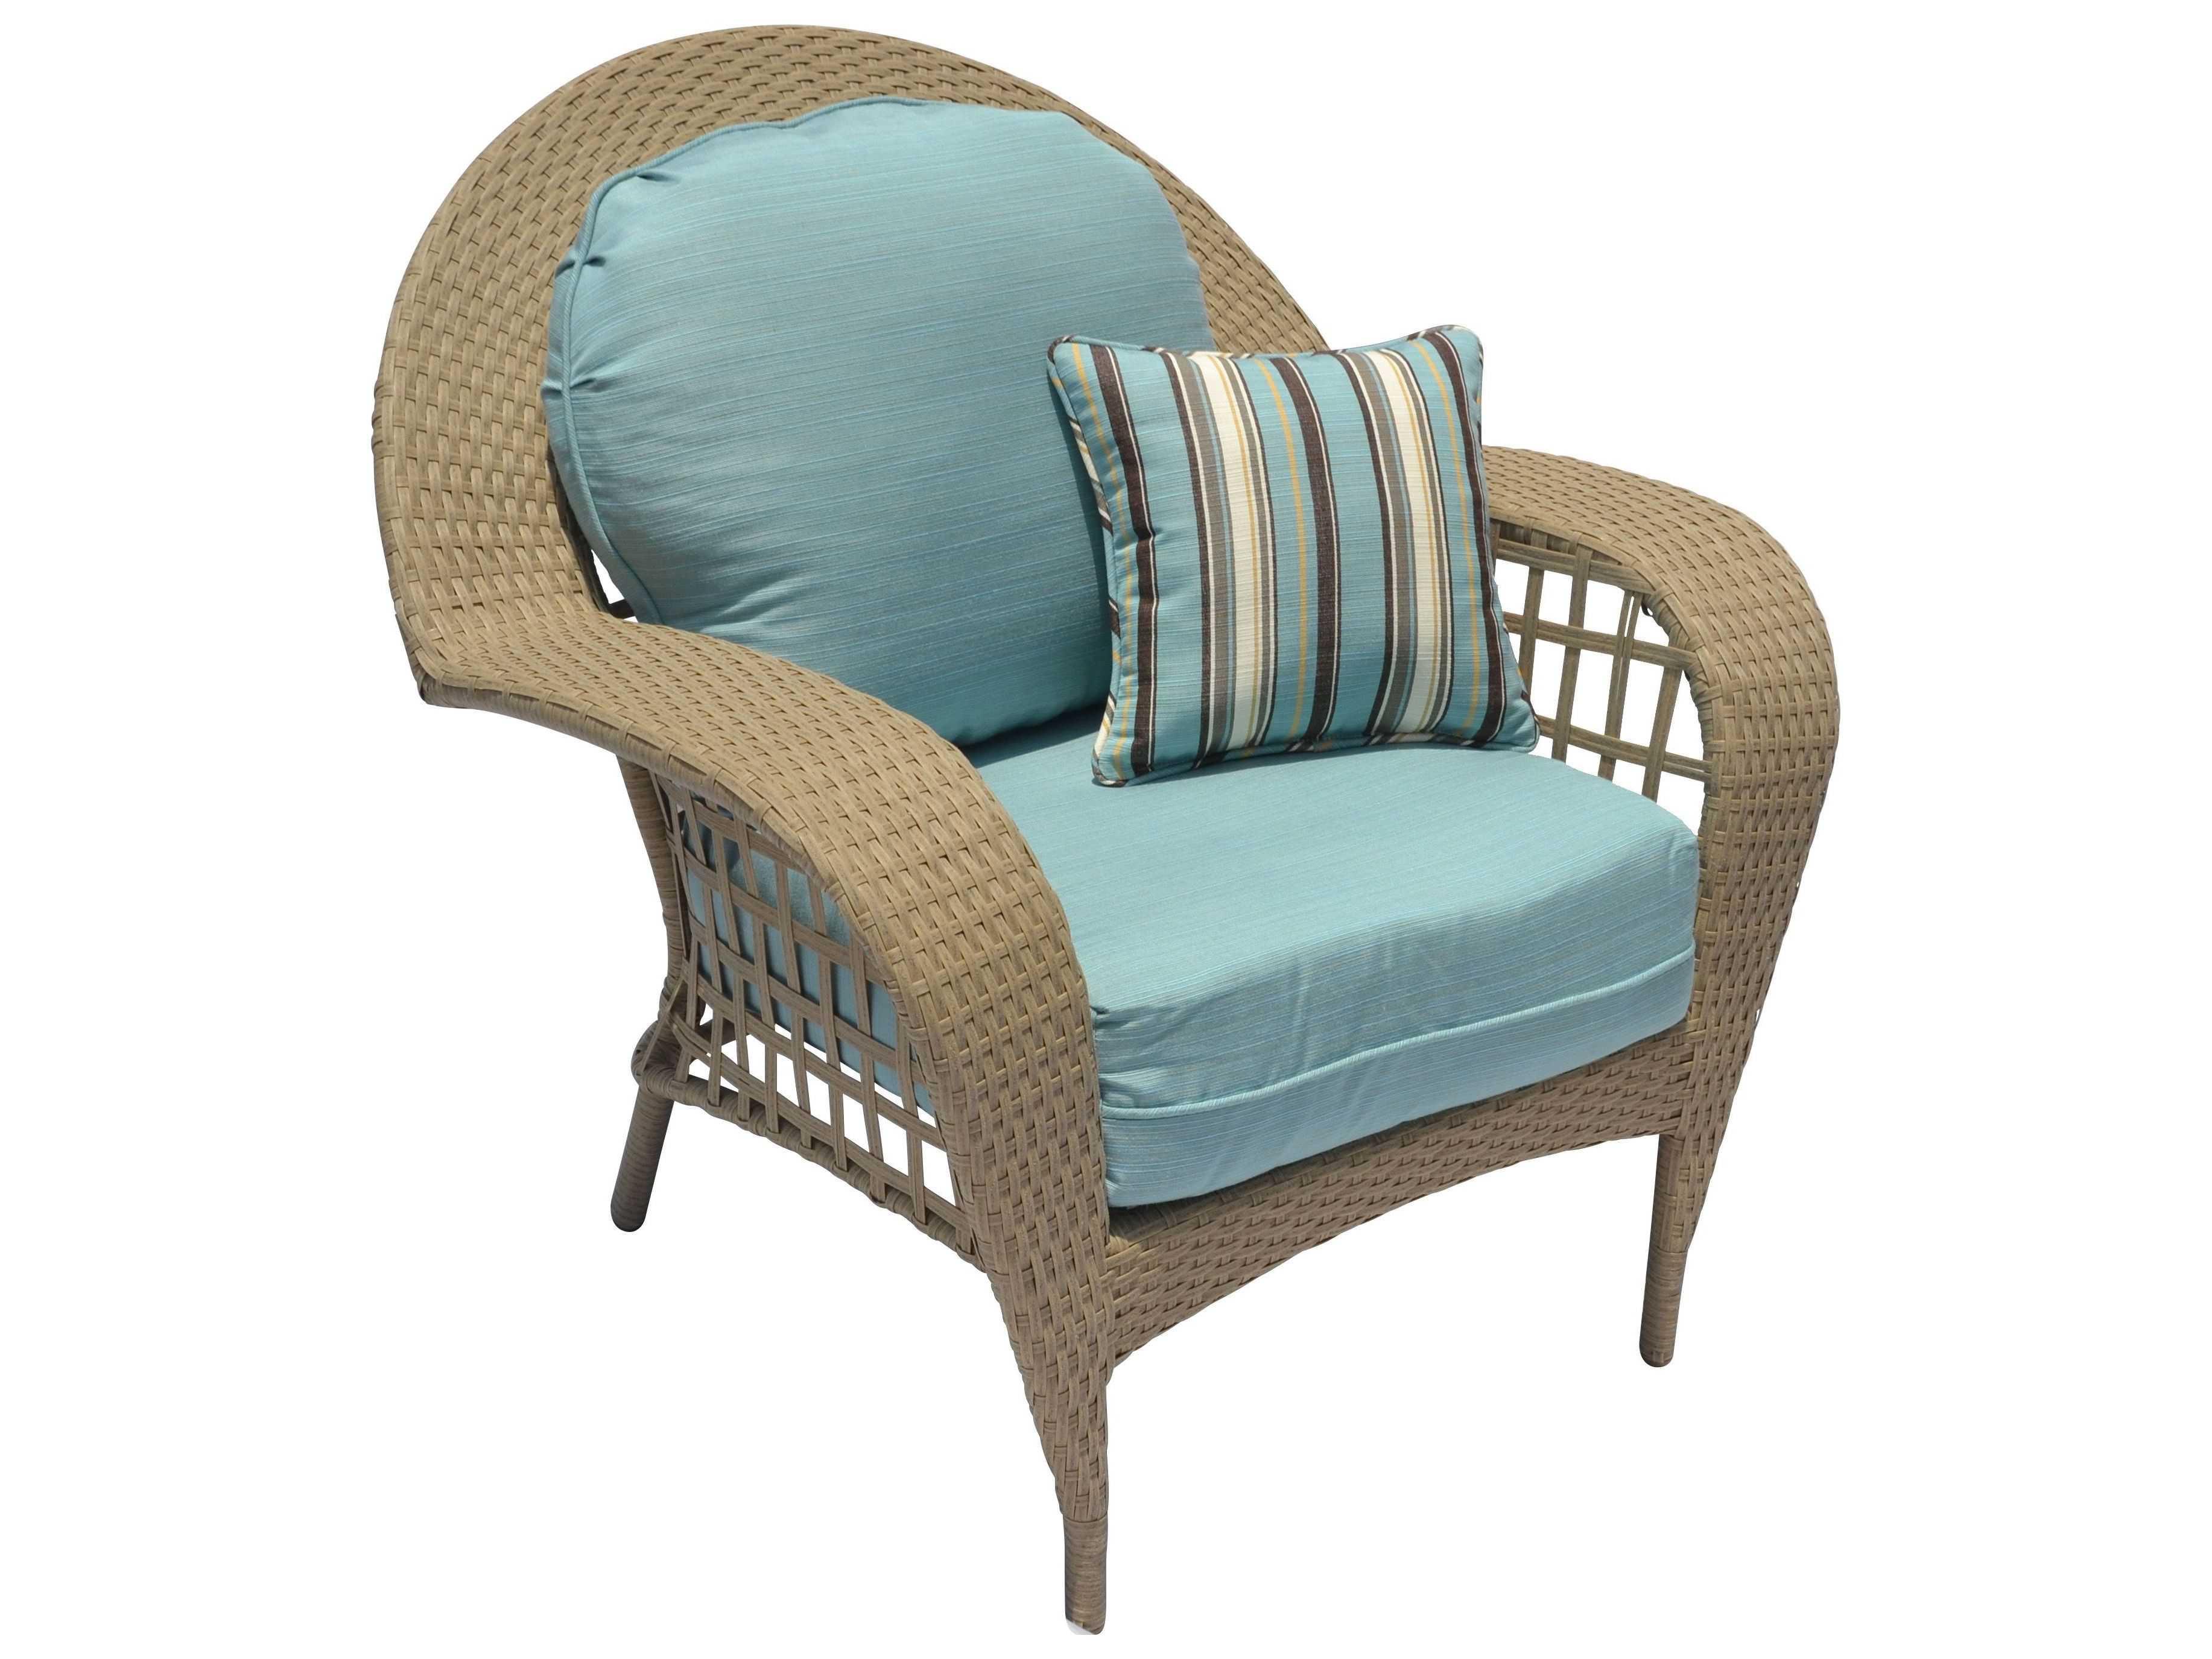 Suncoast Sedona Wicker Lounge Chair